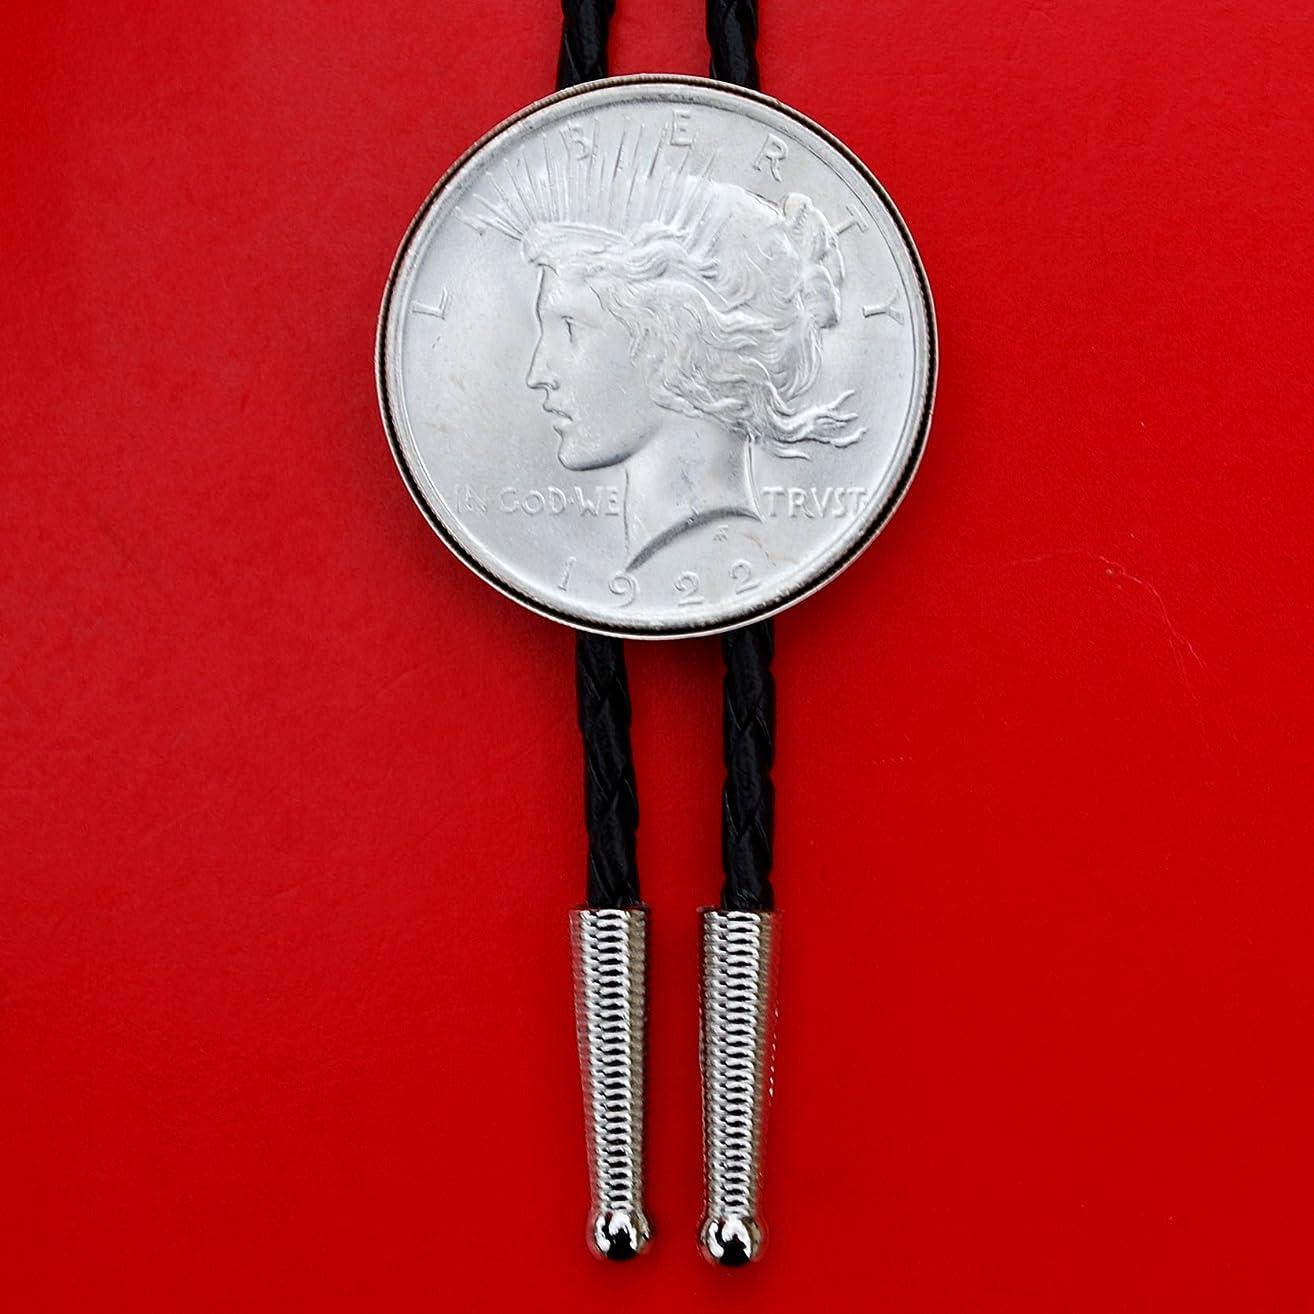 US Genuine 1922 Peace Dollar 90% Silver BU Uncirculated Coin Simple Slide 36